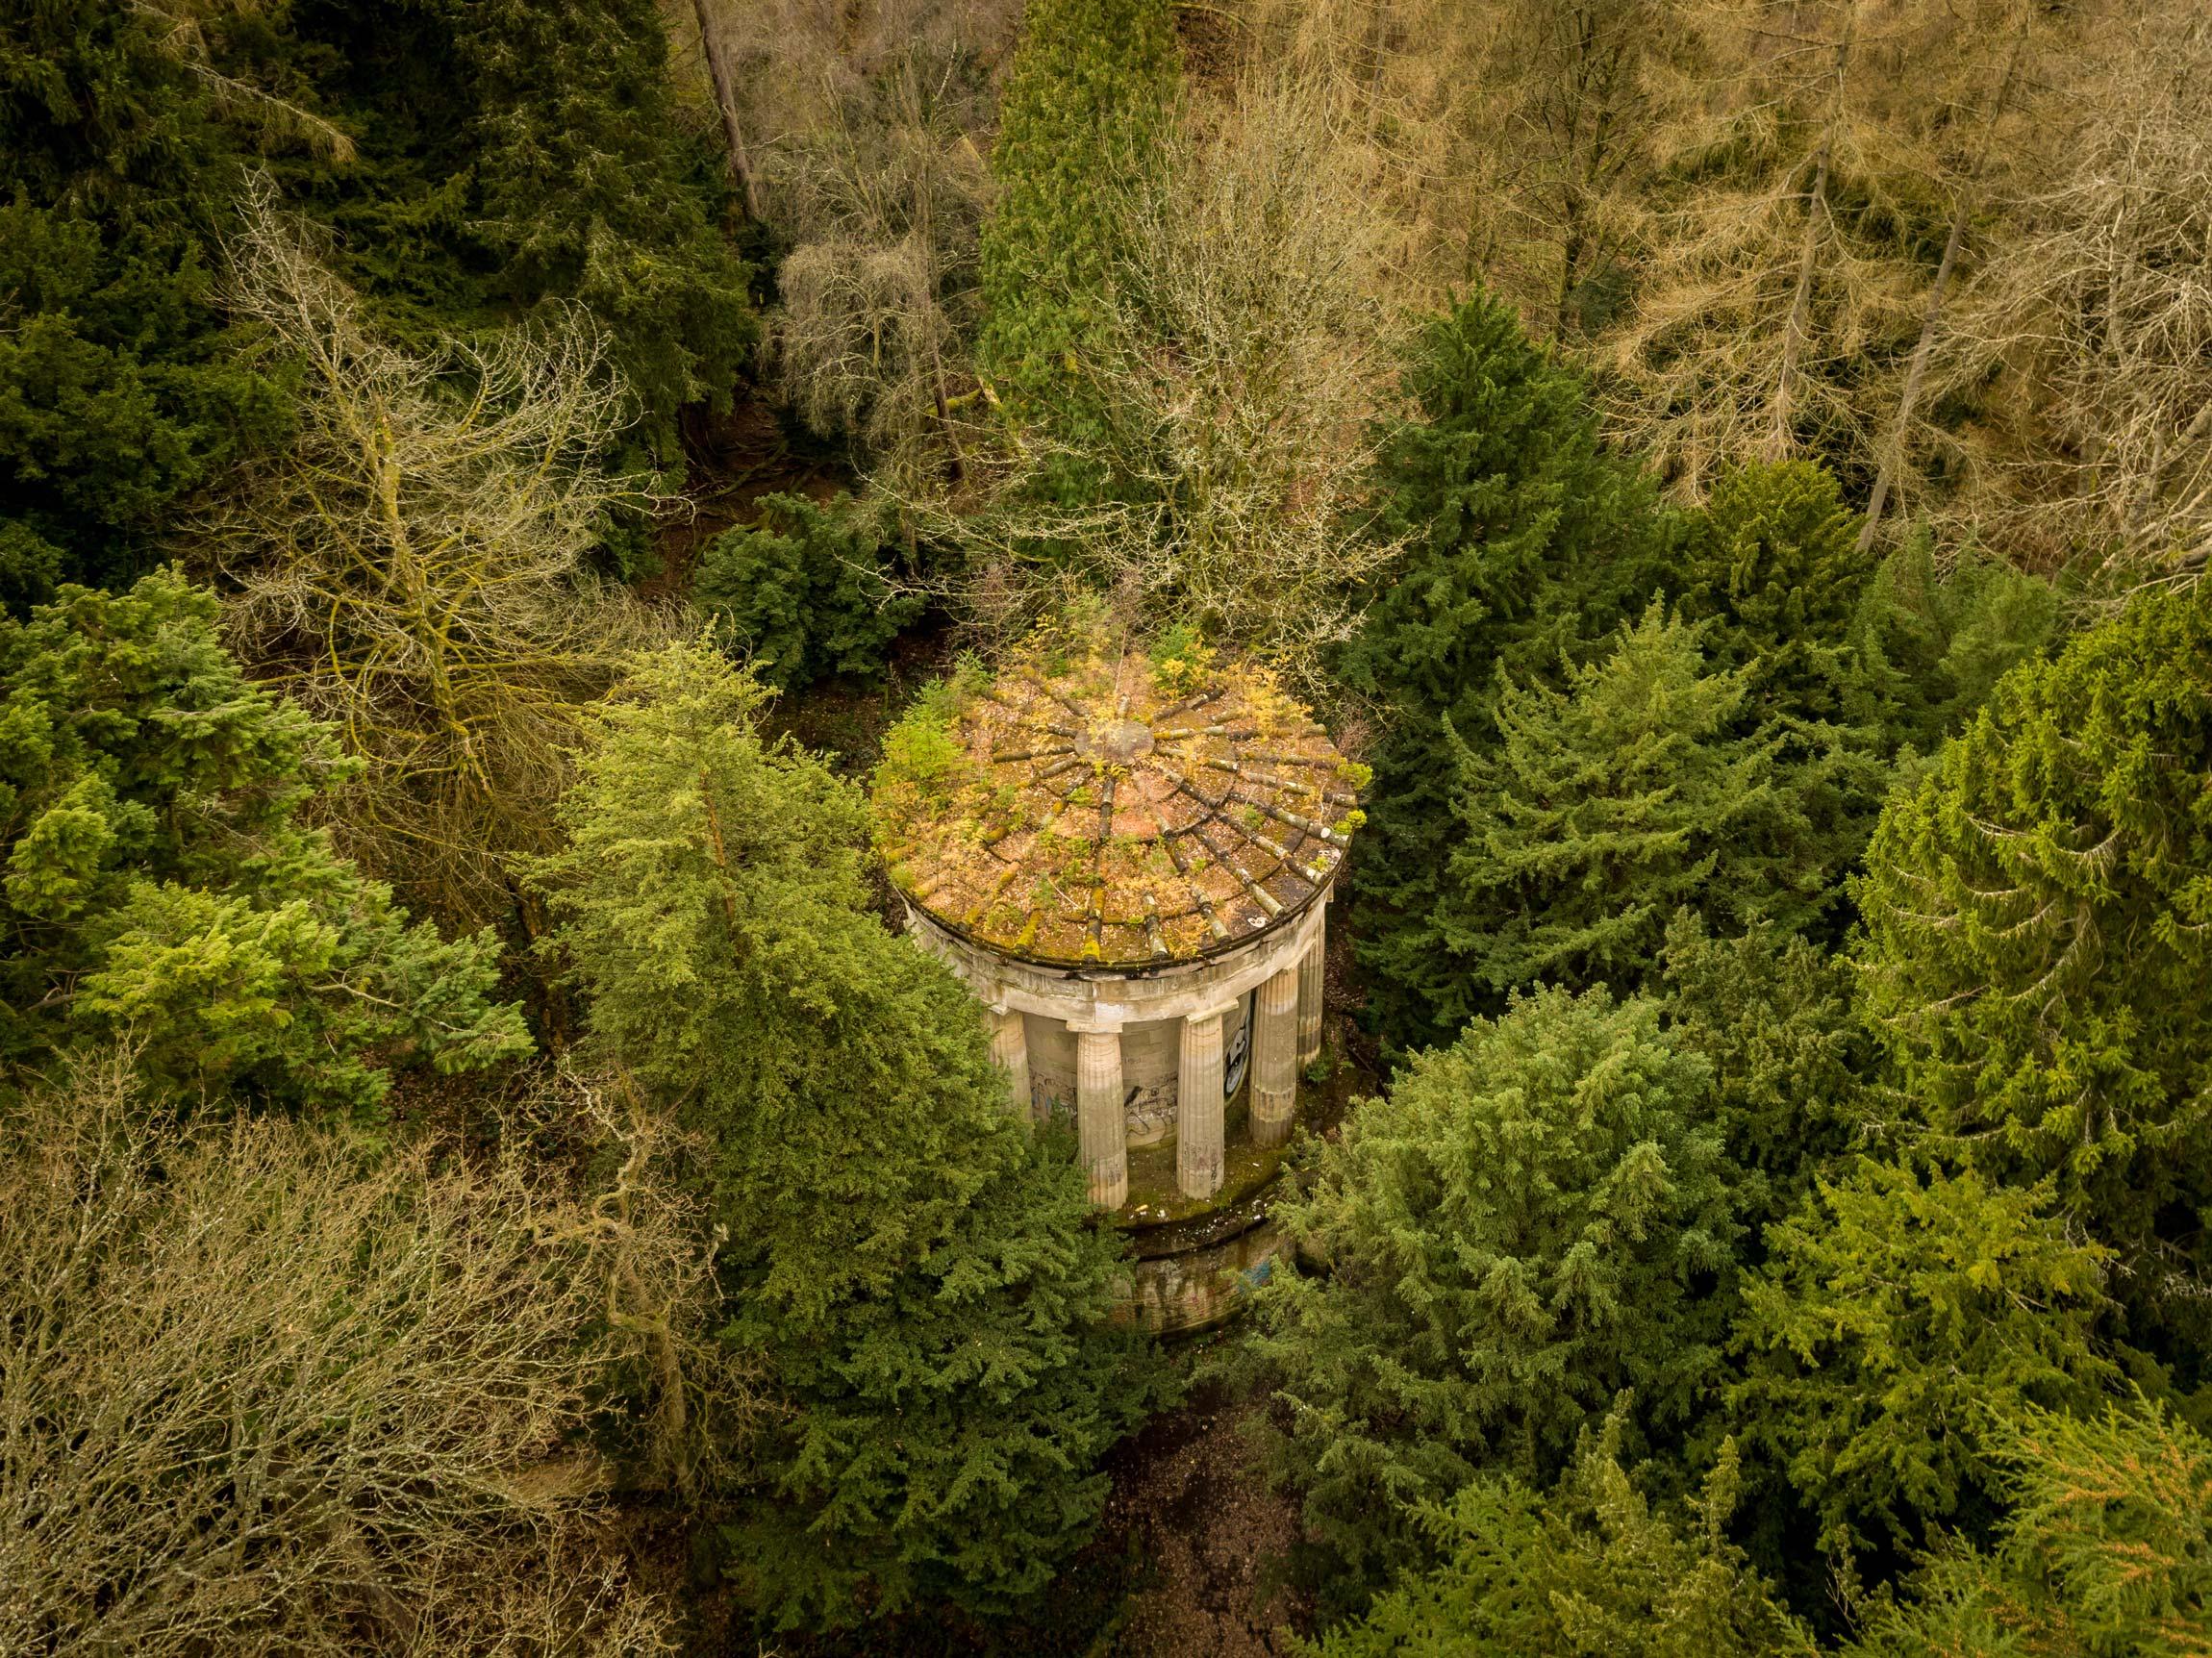 Three Hidden Treasures at Callendar Park